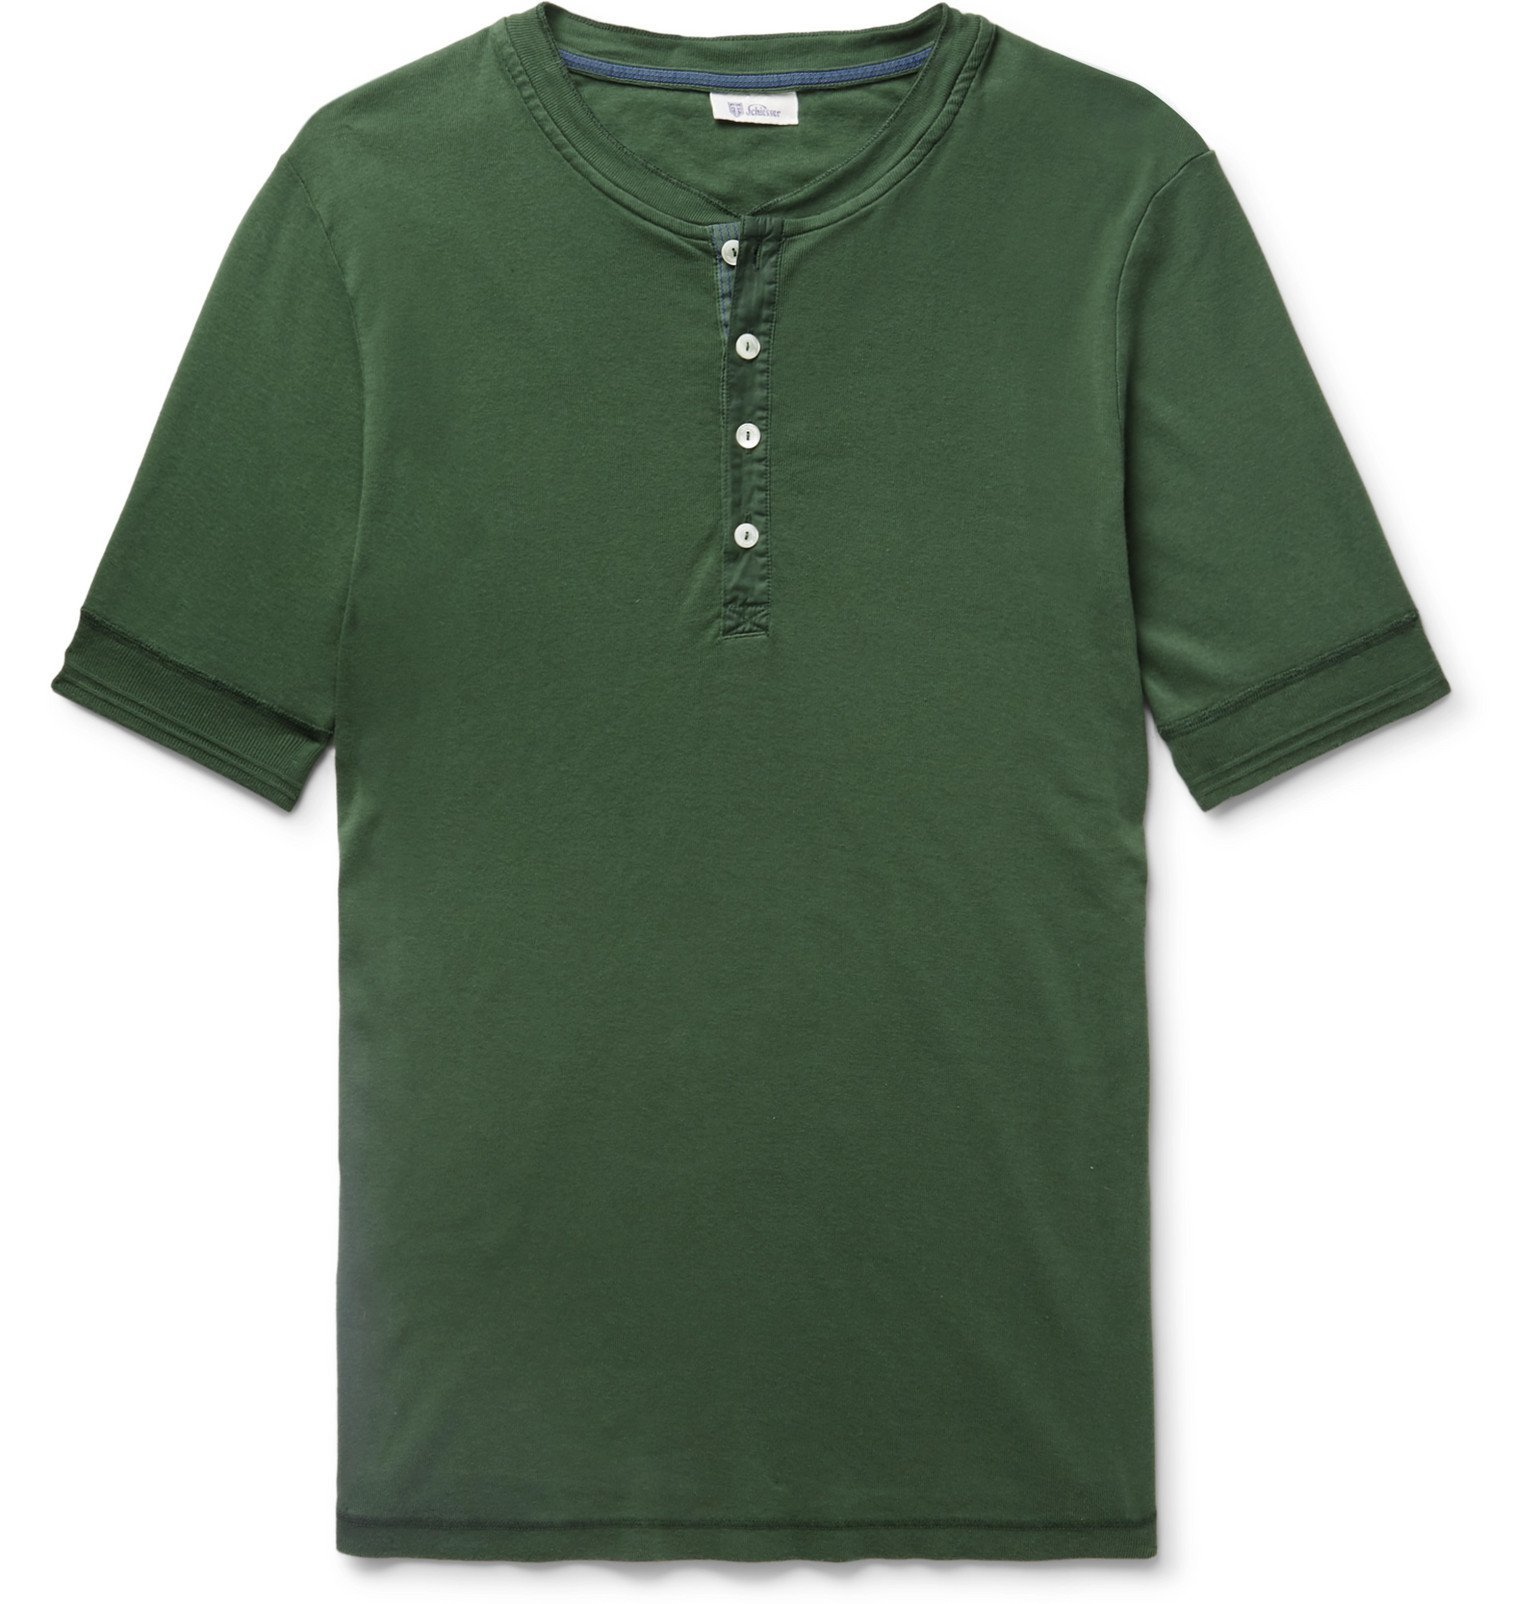 Schiesser - Karl Heinz Cotton-Jersey Henley T-Shirt - Green